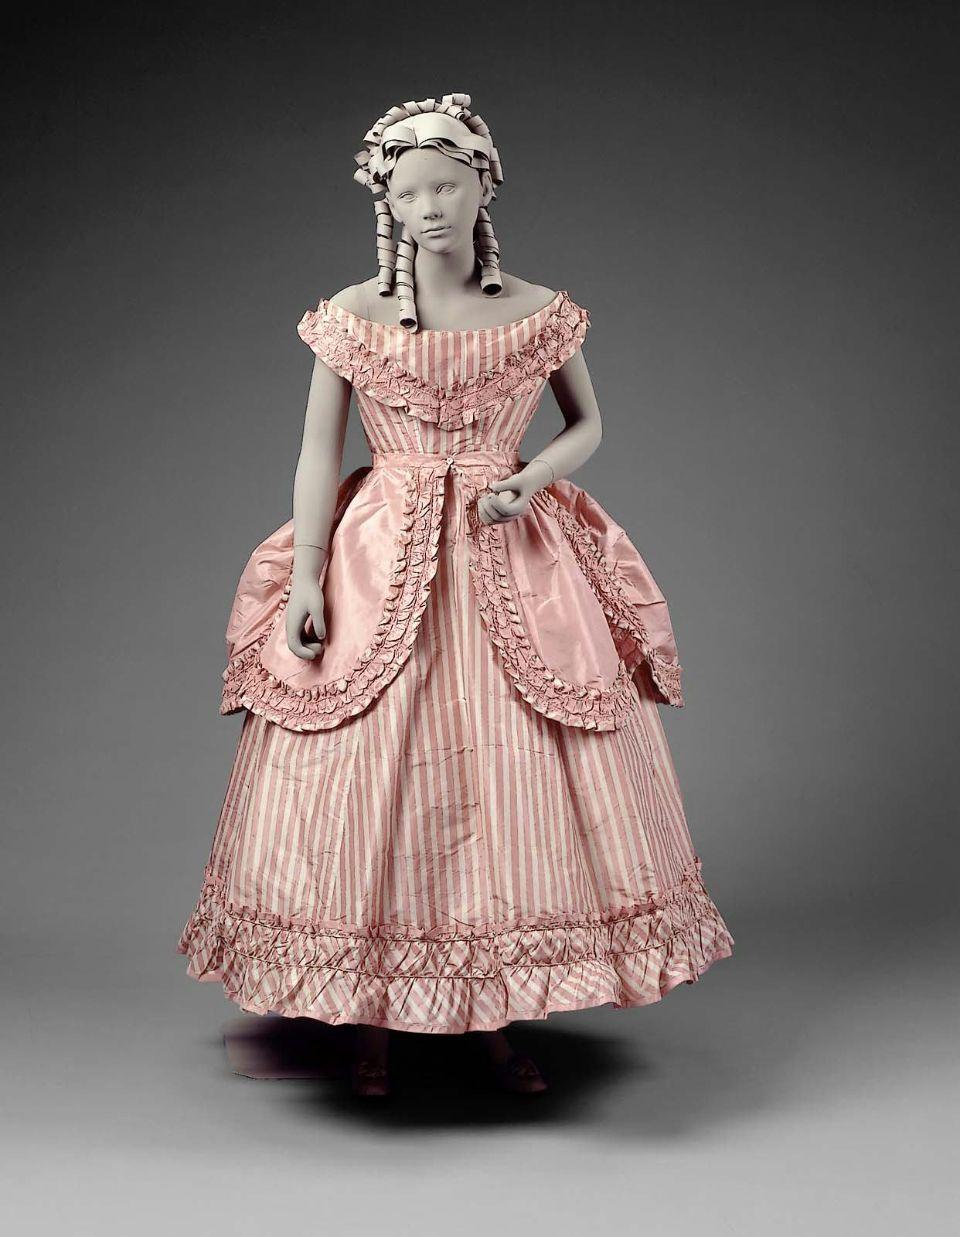 Ephemeral Elegance Girl S Taffeta Party Dress Ca 1865 70 Via Mfa Victorian Children S Clothing Girls Party Dress Historical Dresses [ 1237 x 960 Pixel ]